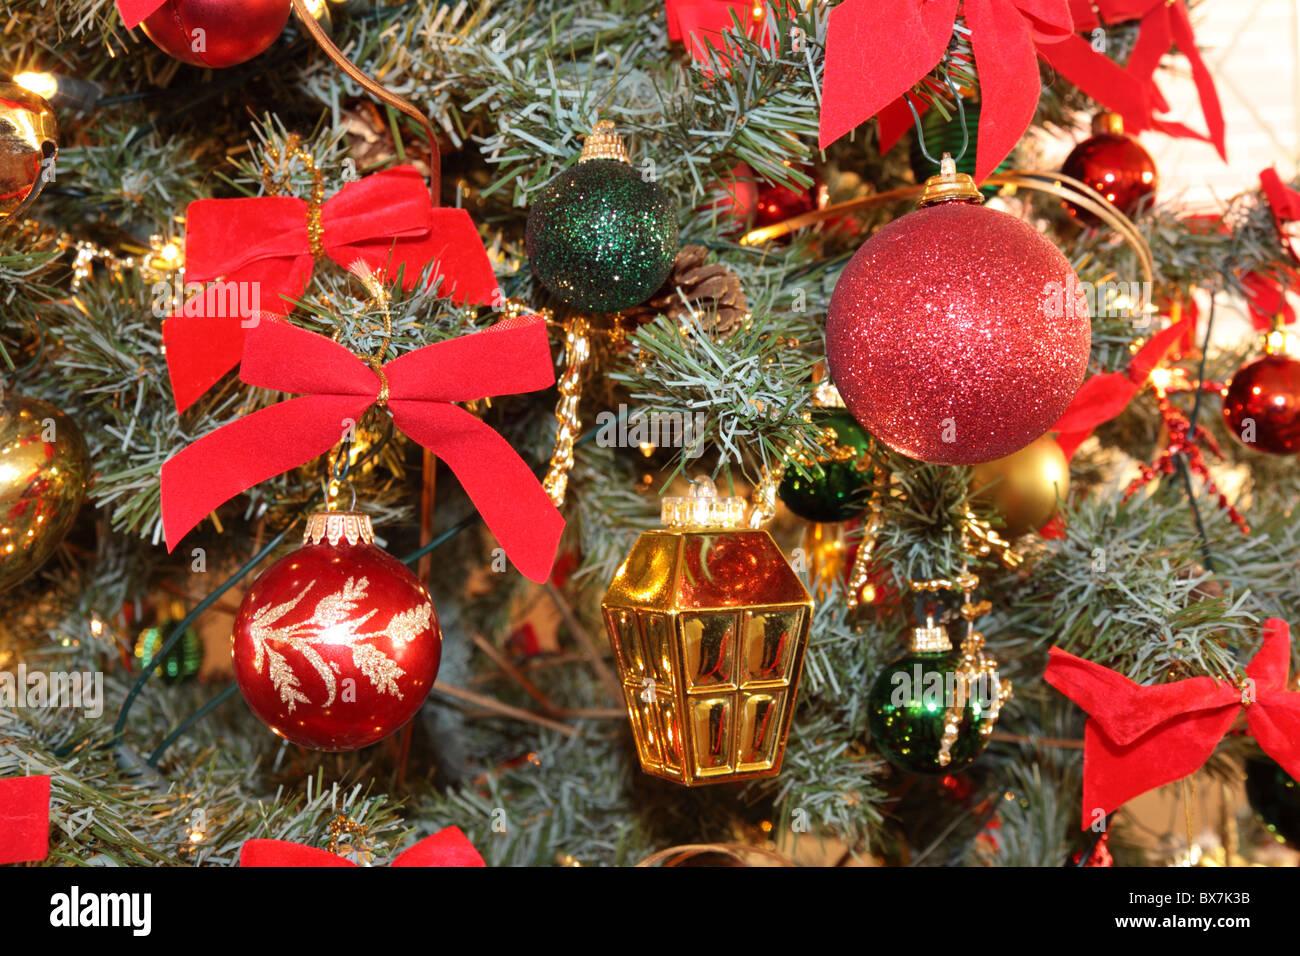 Christmas Tree Decorations - Stock Image